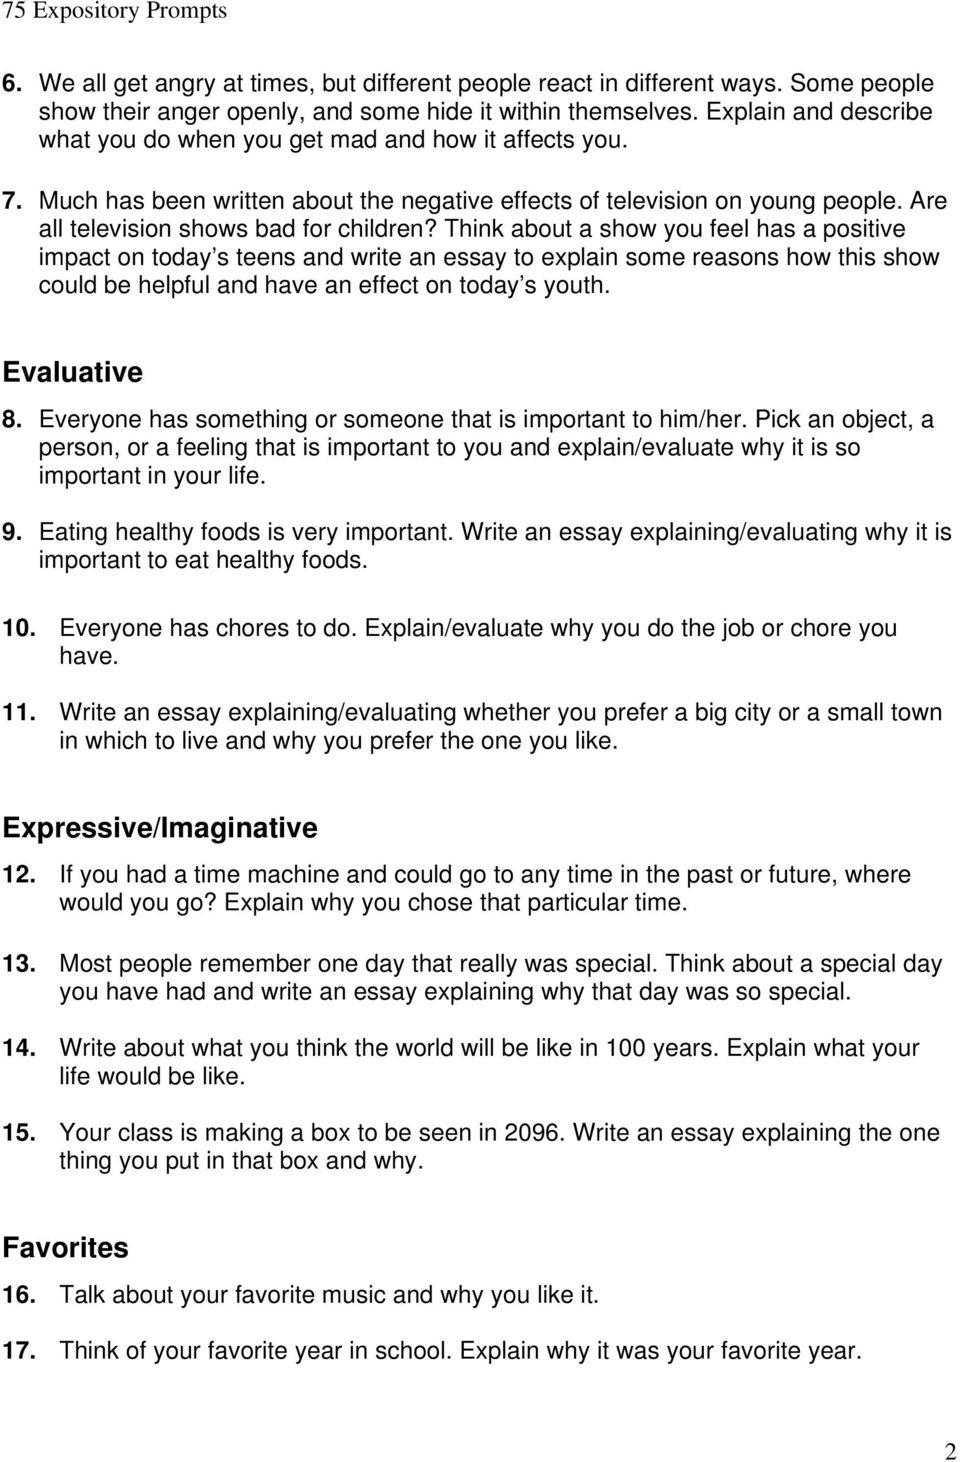 My favorite writer essay analysis template